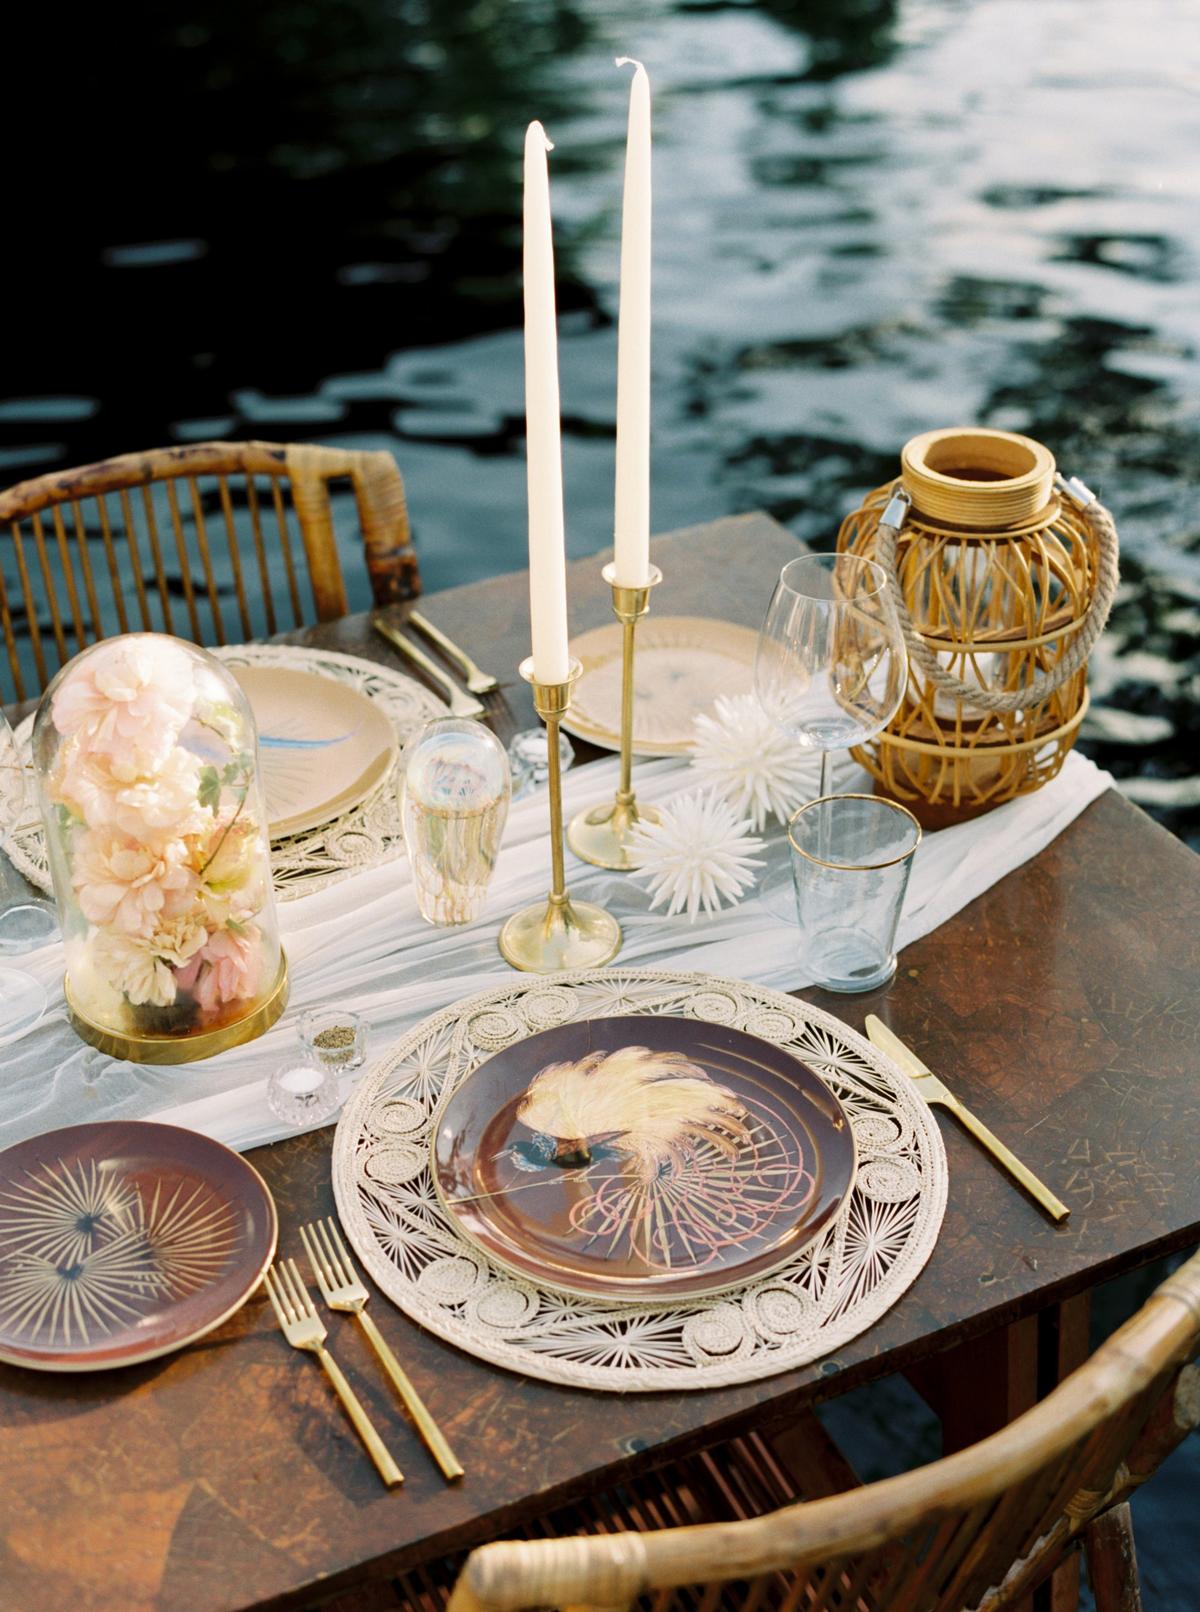 turks and caicos shoot erich mcvey tablescape brown plates rattan florals